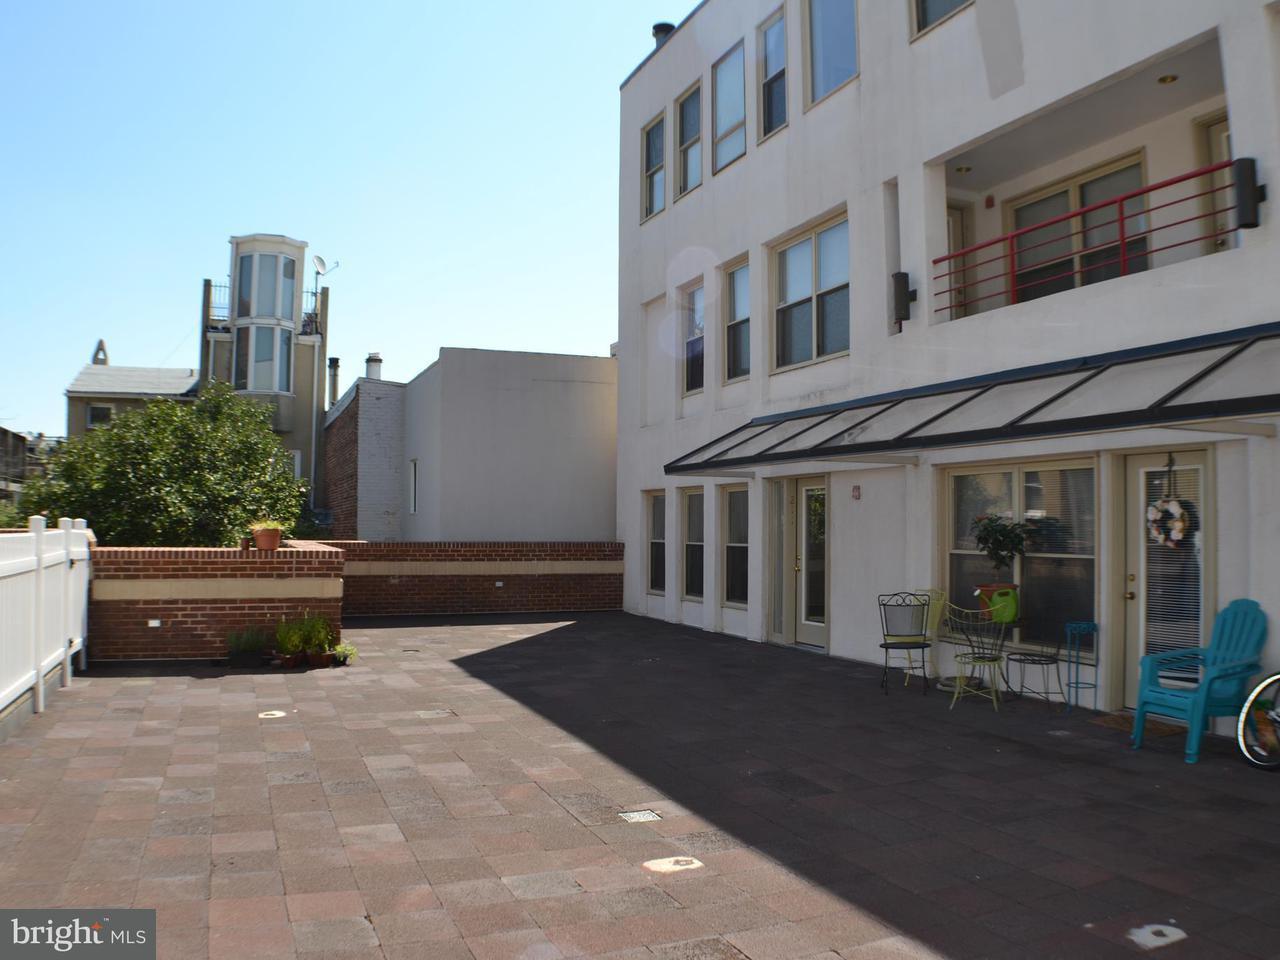 Condominium for Rent at 2 Wheeling St #211 Baltimore, Maryland 21230 United States